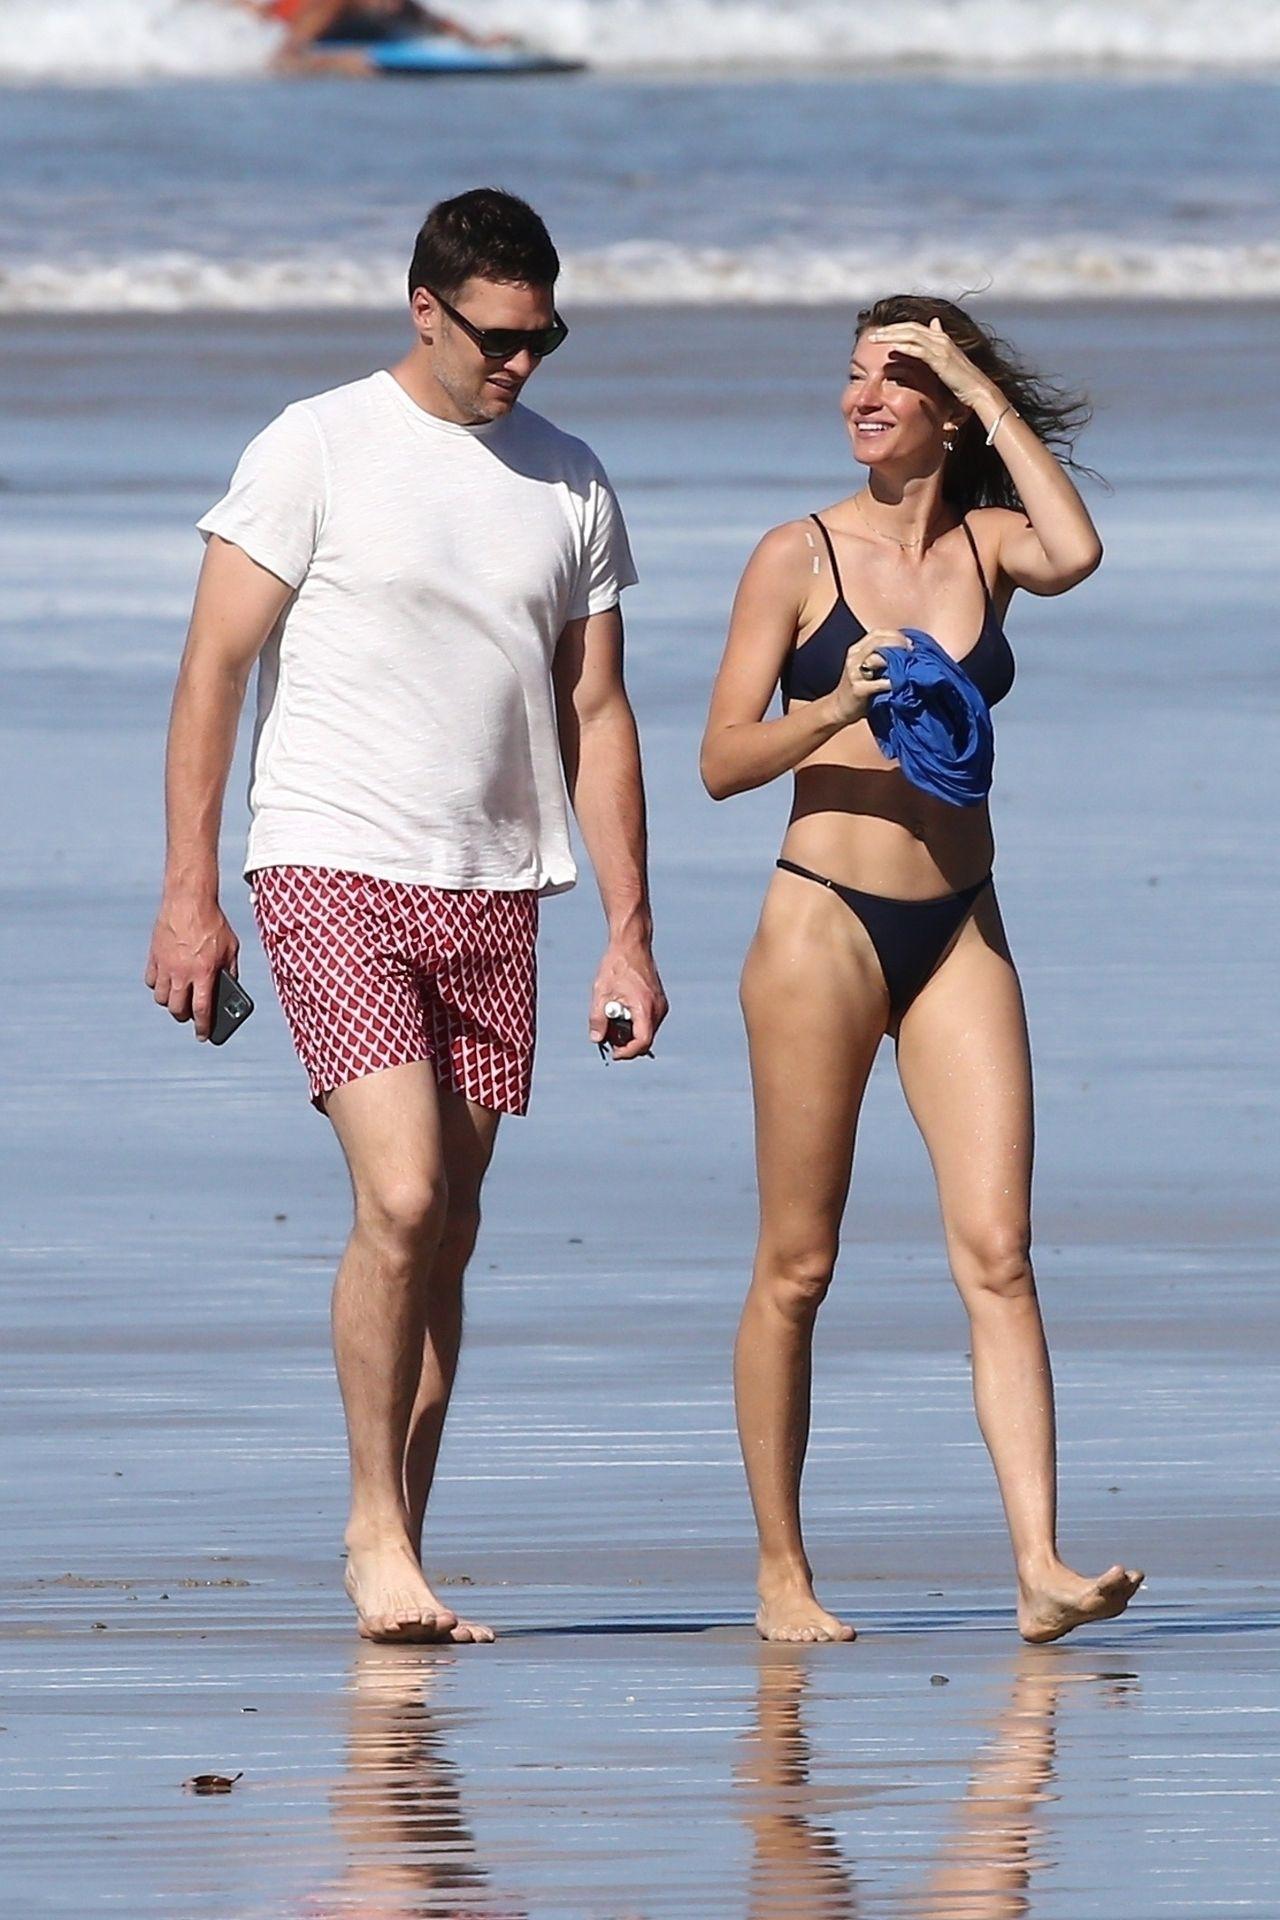 Tom Brady & Gisele Bundchen Pack On The Pda At The Beach 0016